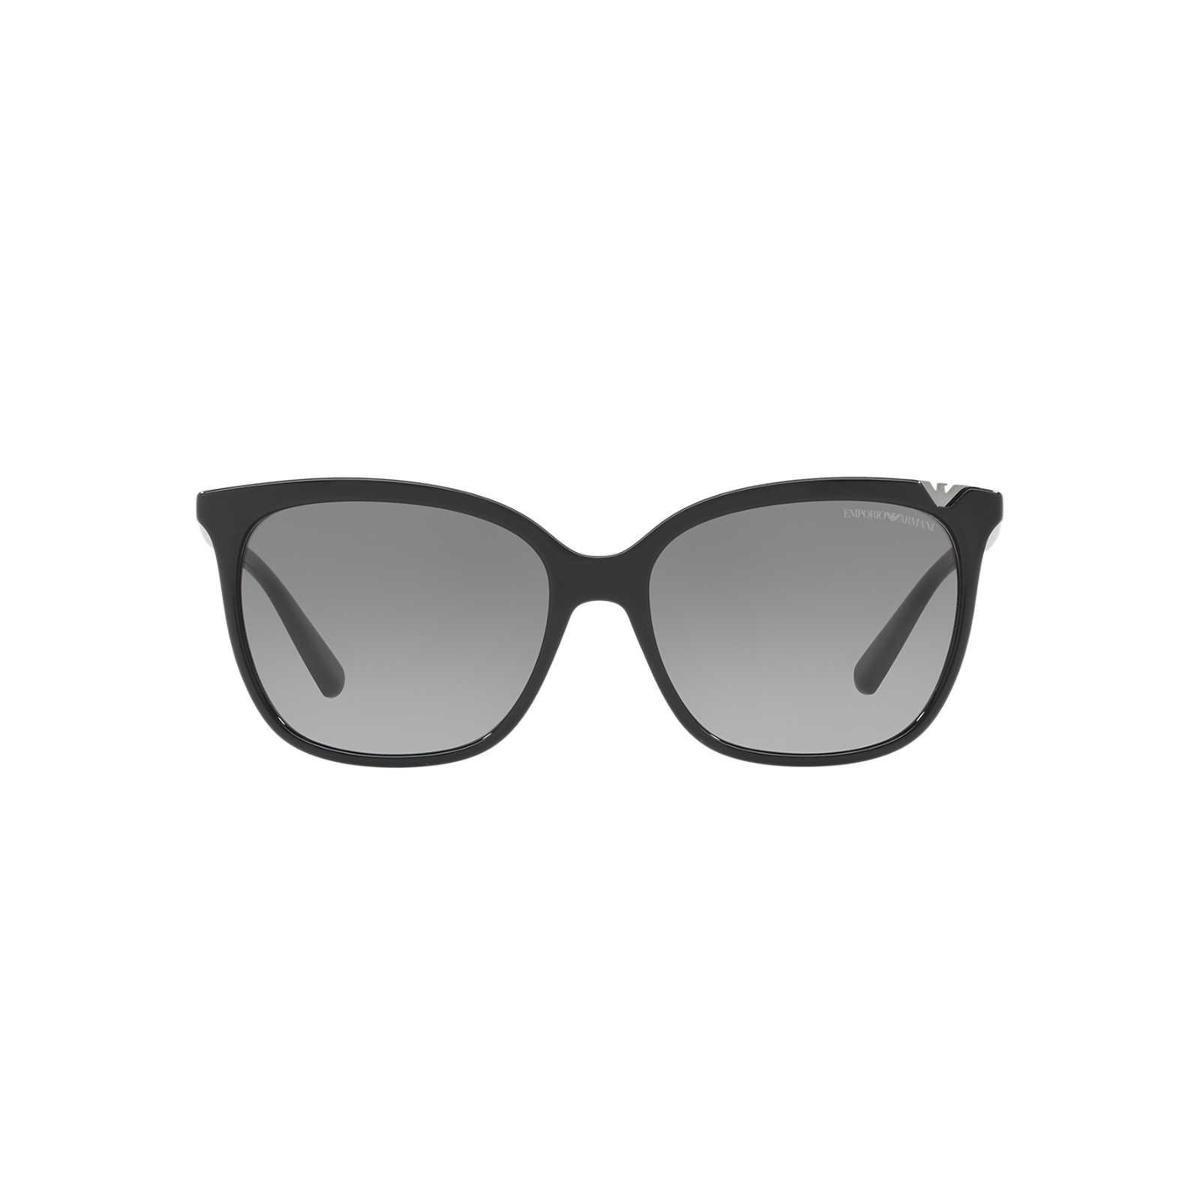 Óculos de Sol Emporio Armani Quadrado EA4094 Feminino - Compre Agora ... 55db1b0108d41